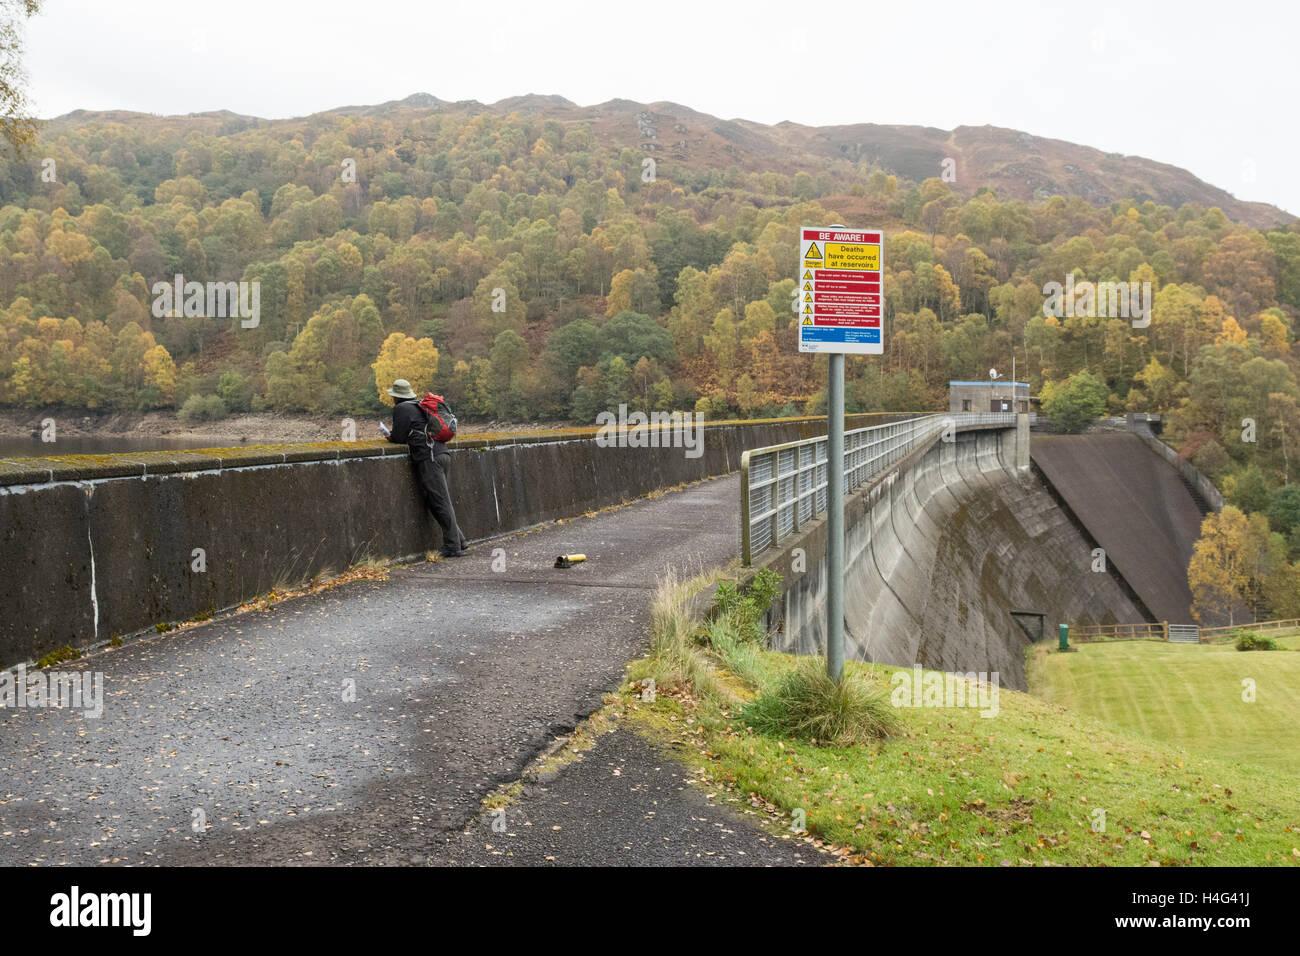 top of Glen Finglas Reservoir and 'deaths have occurred at reservoirs' warning sign, Glen Finglas, Trossachs, - Stock Image